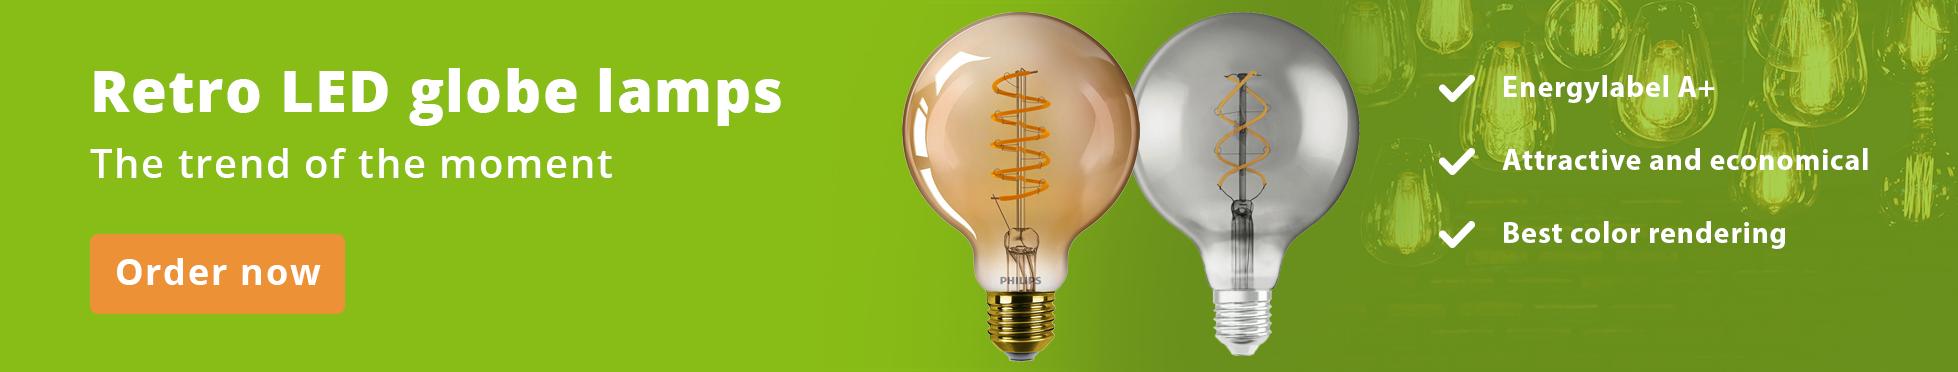 BL Retro LED bulbs UK B0123